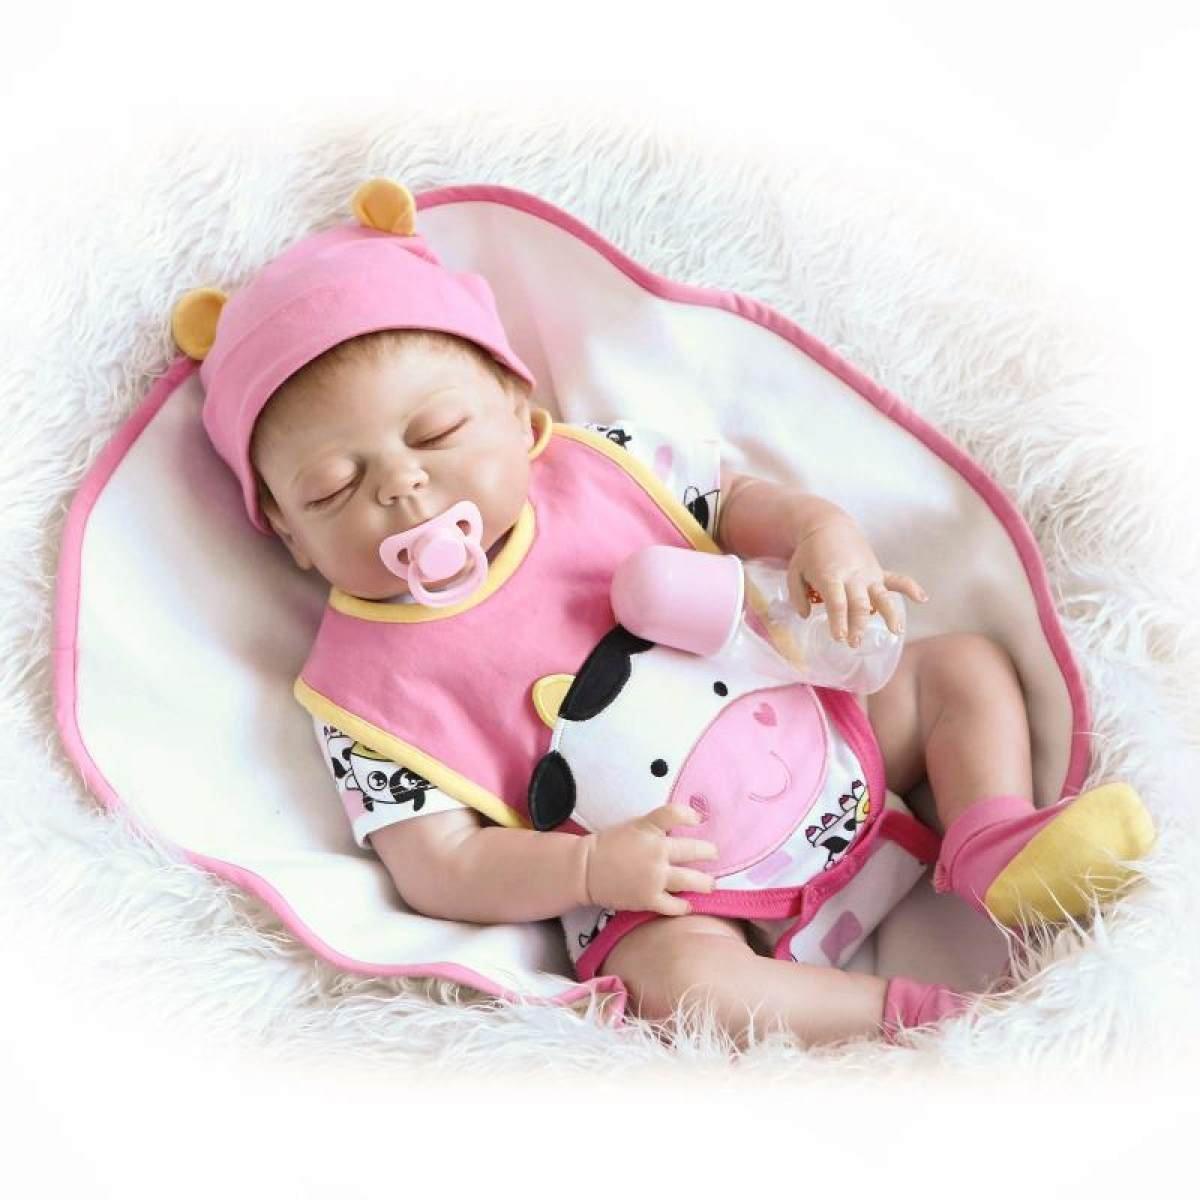 Yihang Rebornベビー人形SiliconeビニールLongロングヘアリアルな美しいLifelike Girl FunギフトCan Canシミュレーション人形リアル赤ちゃん B07BYJ2K2W